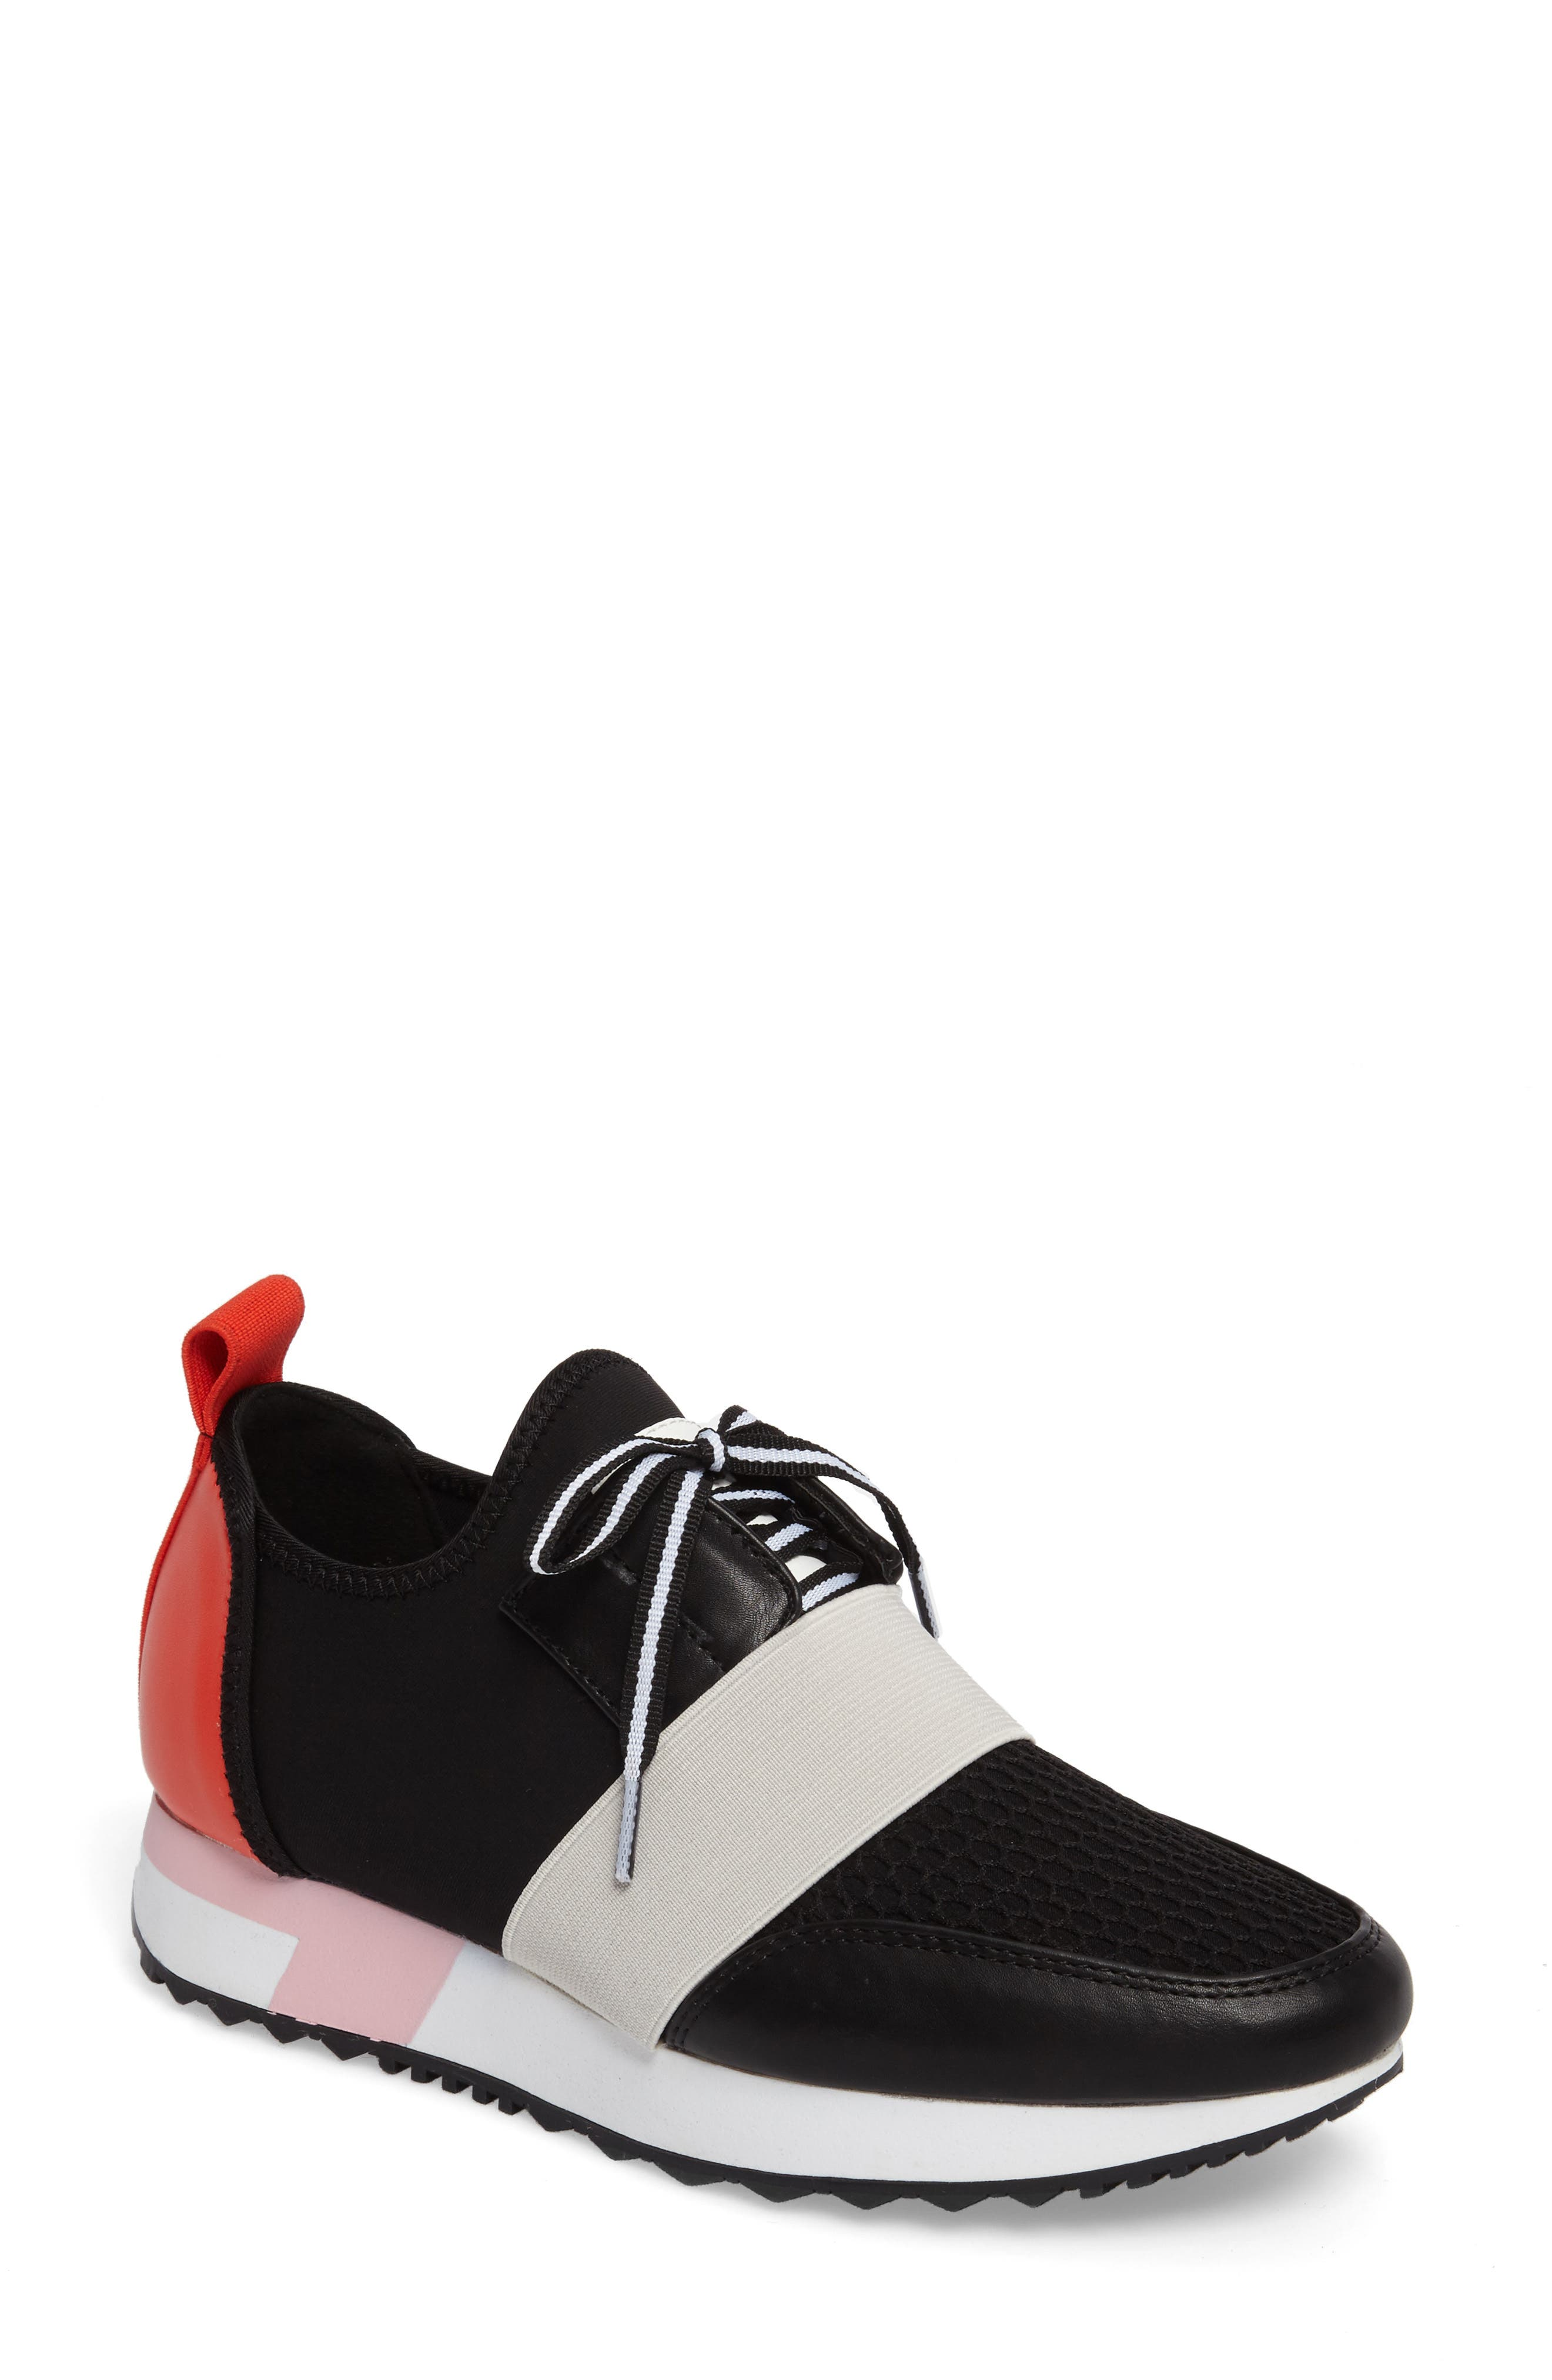 Antics Sneaker,                         Main,                         color, 015